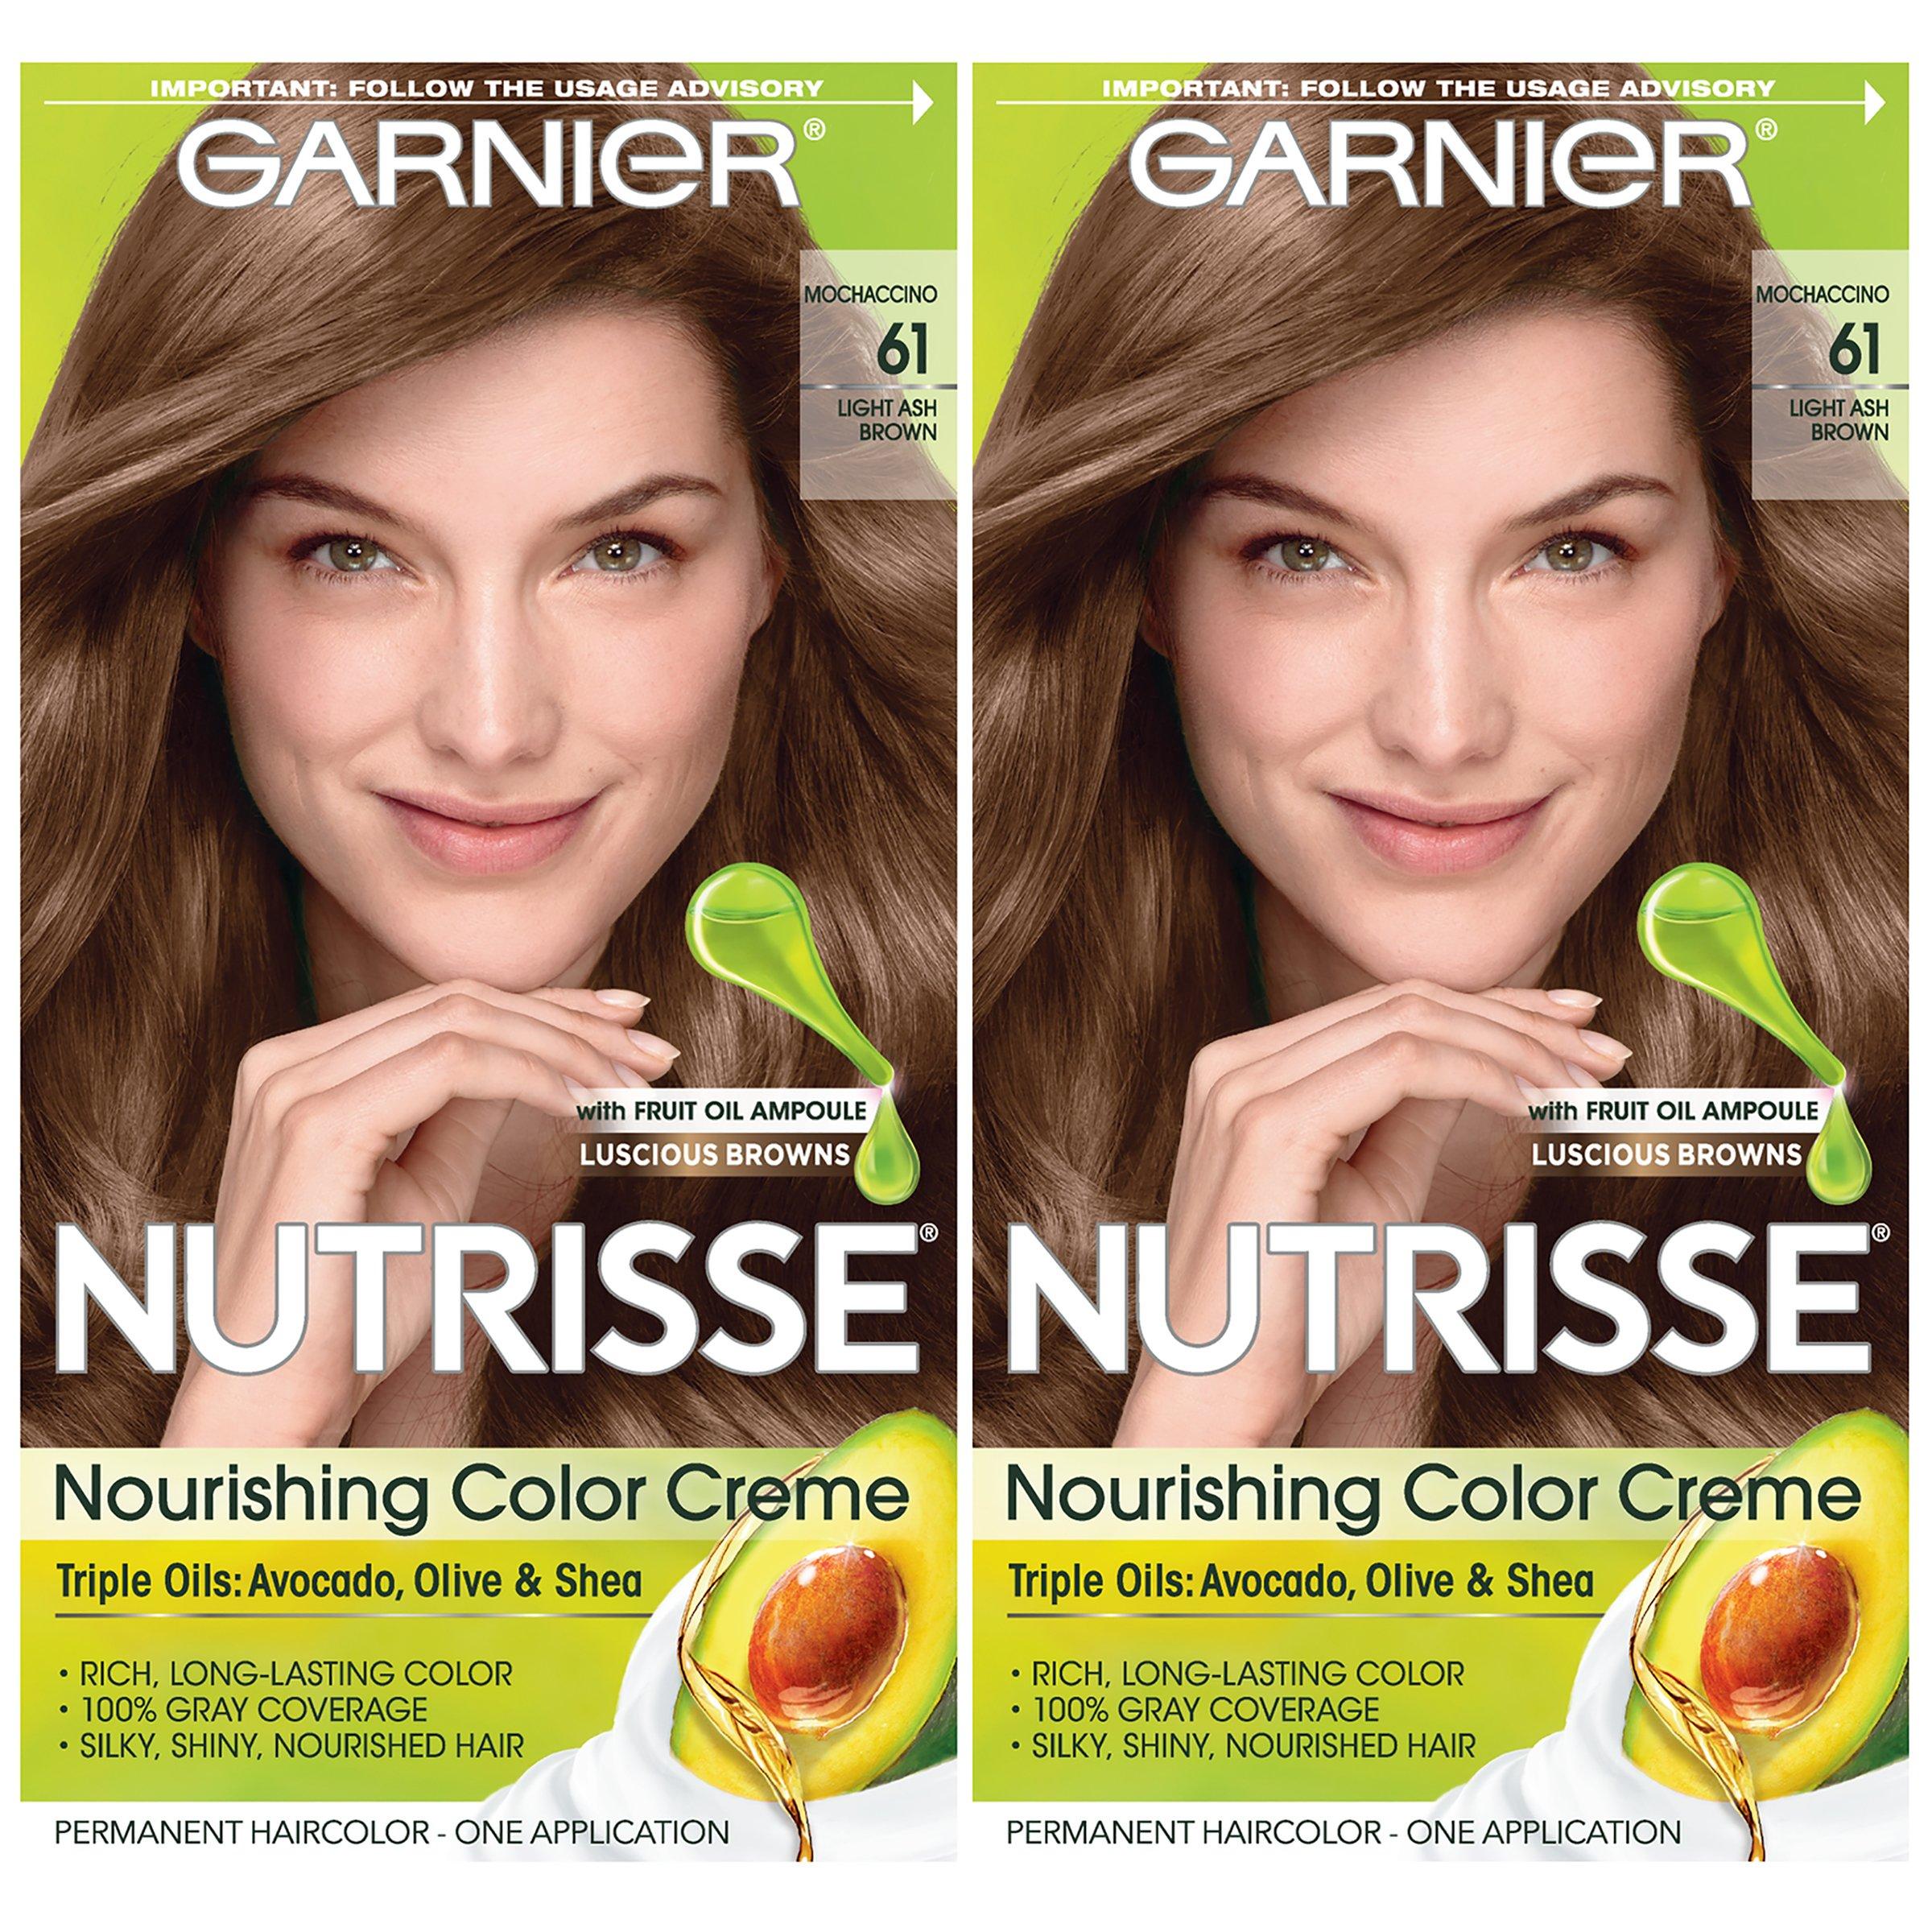 garnier hair color